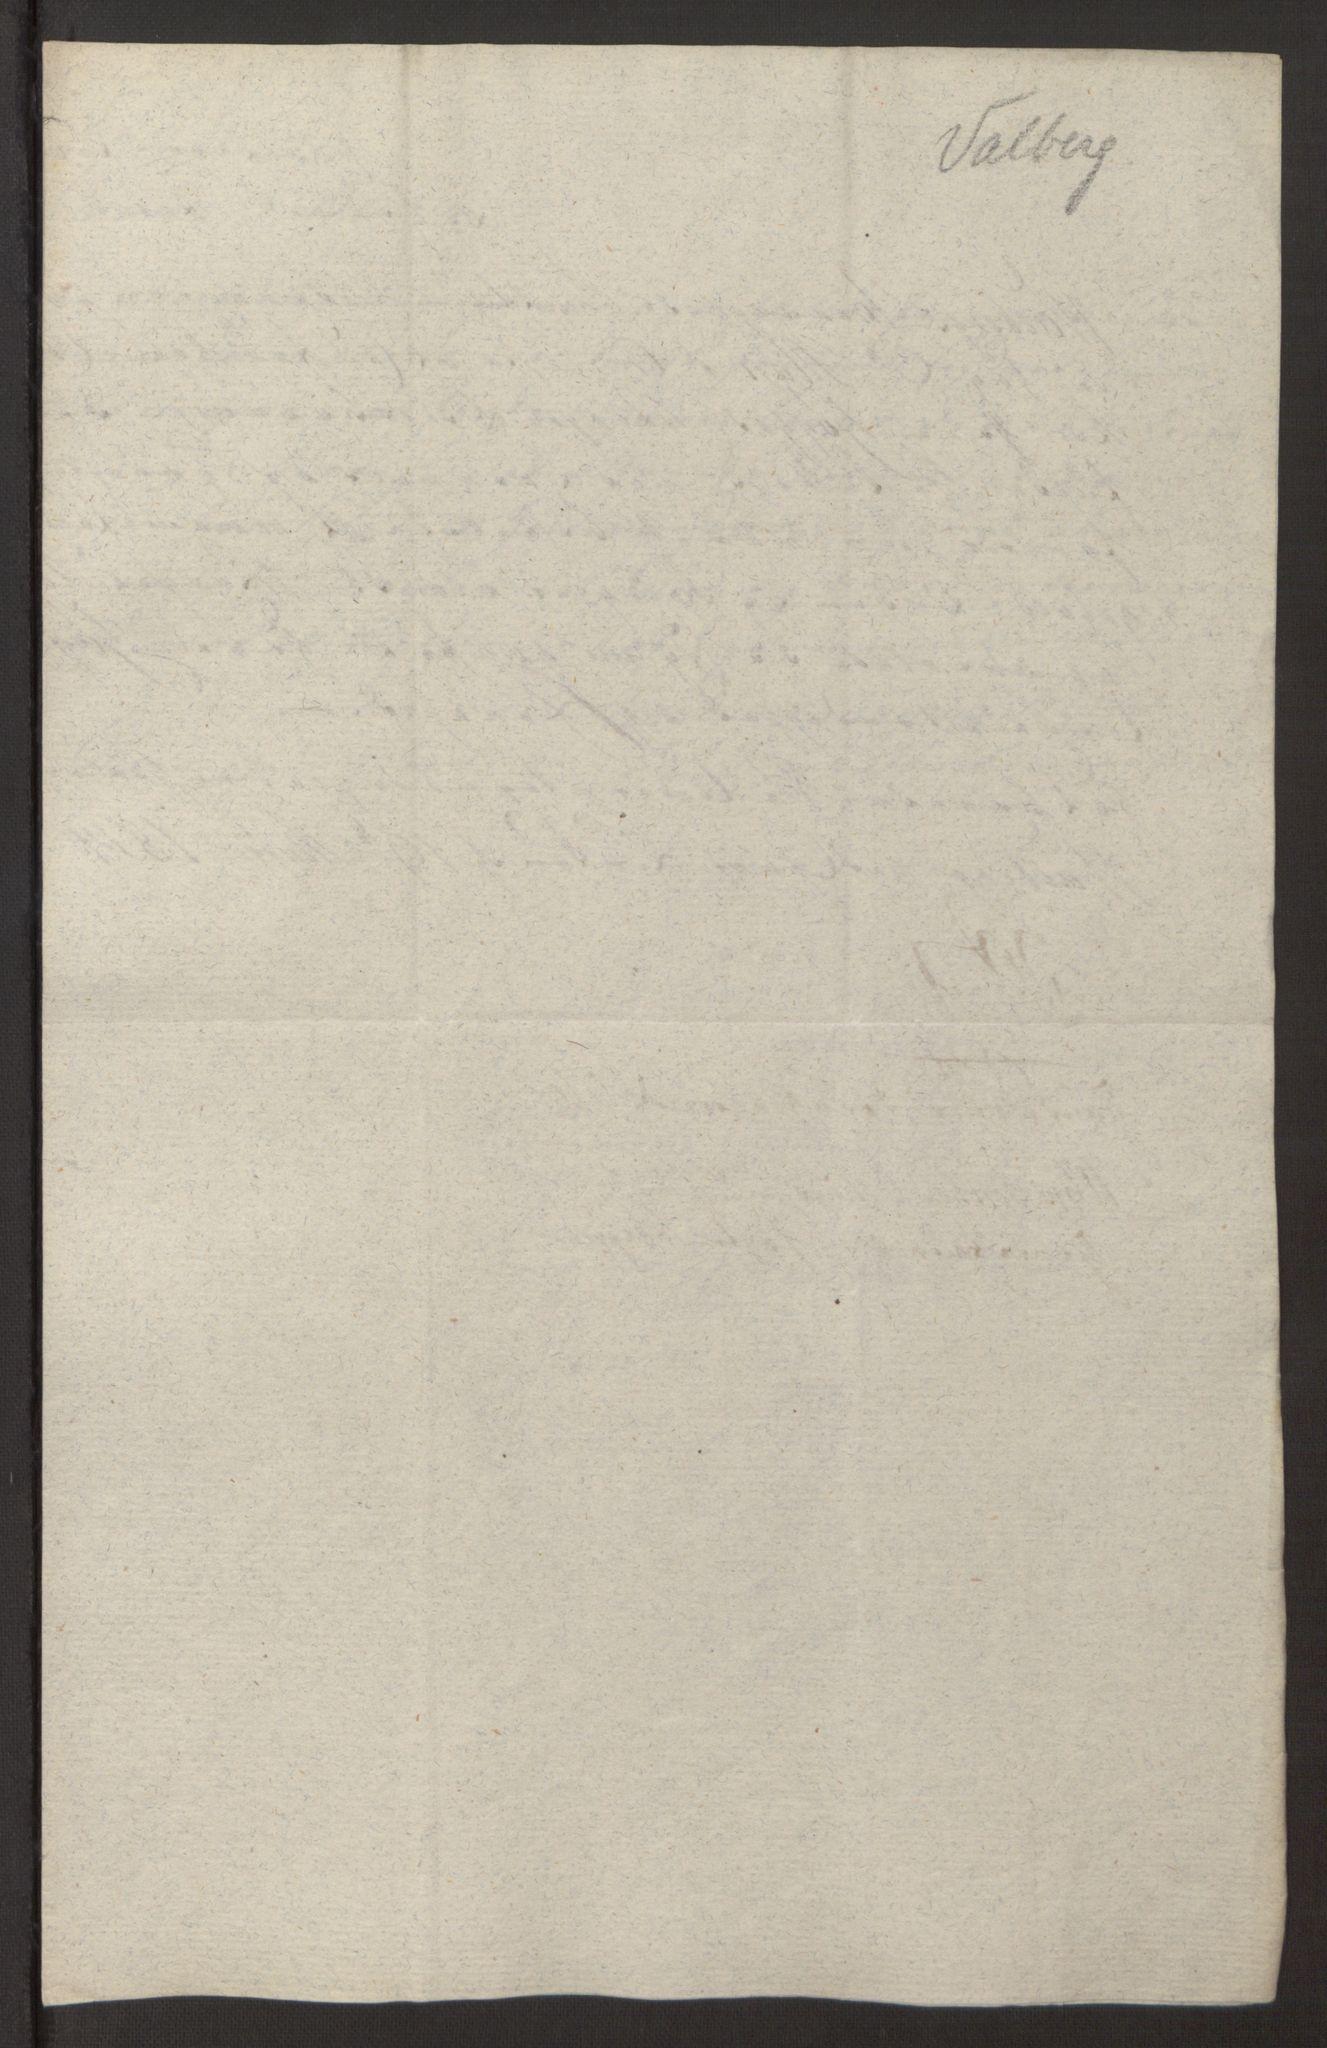 SAT, Nordland amt/fylke*, 1814, s. 20